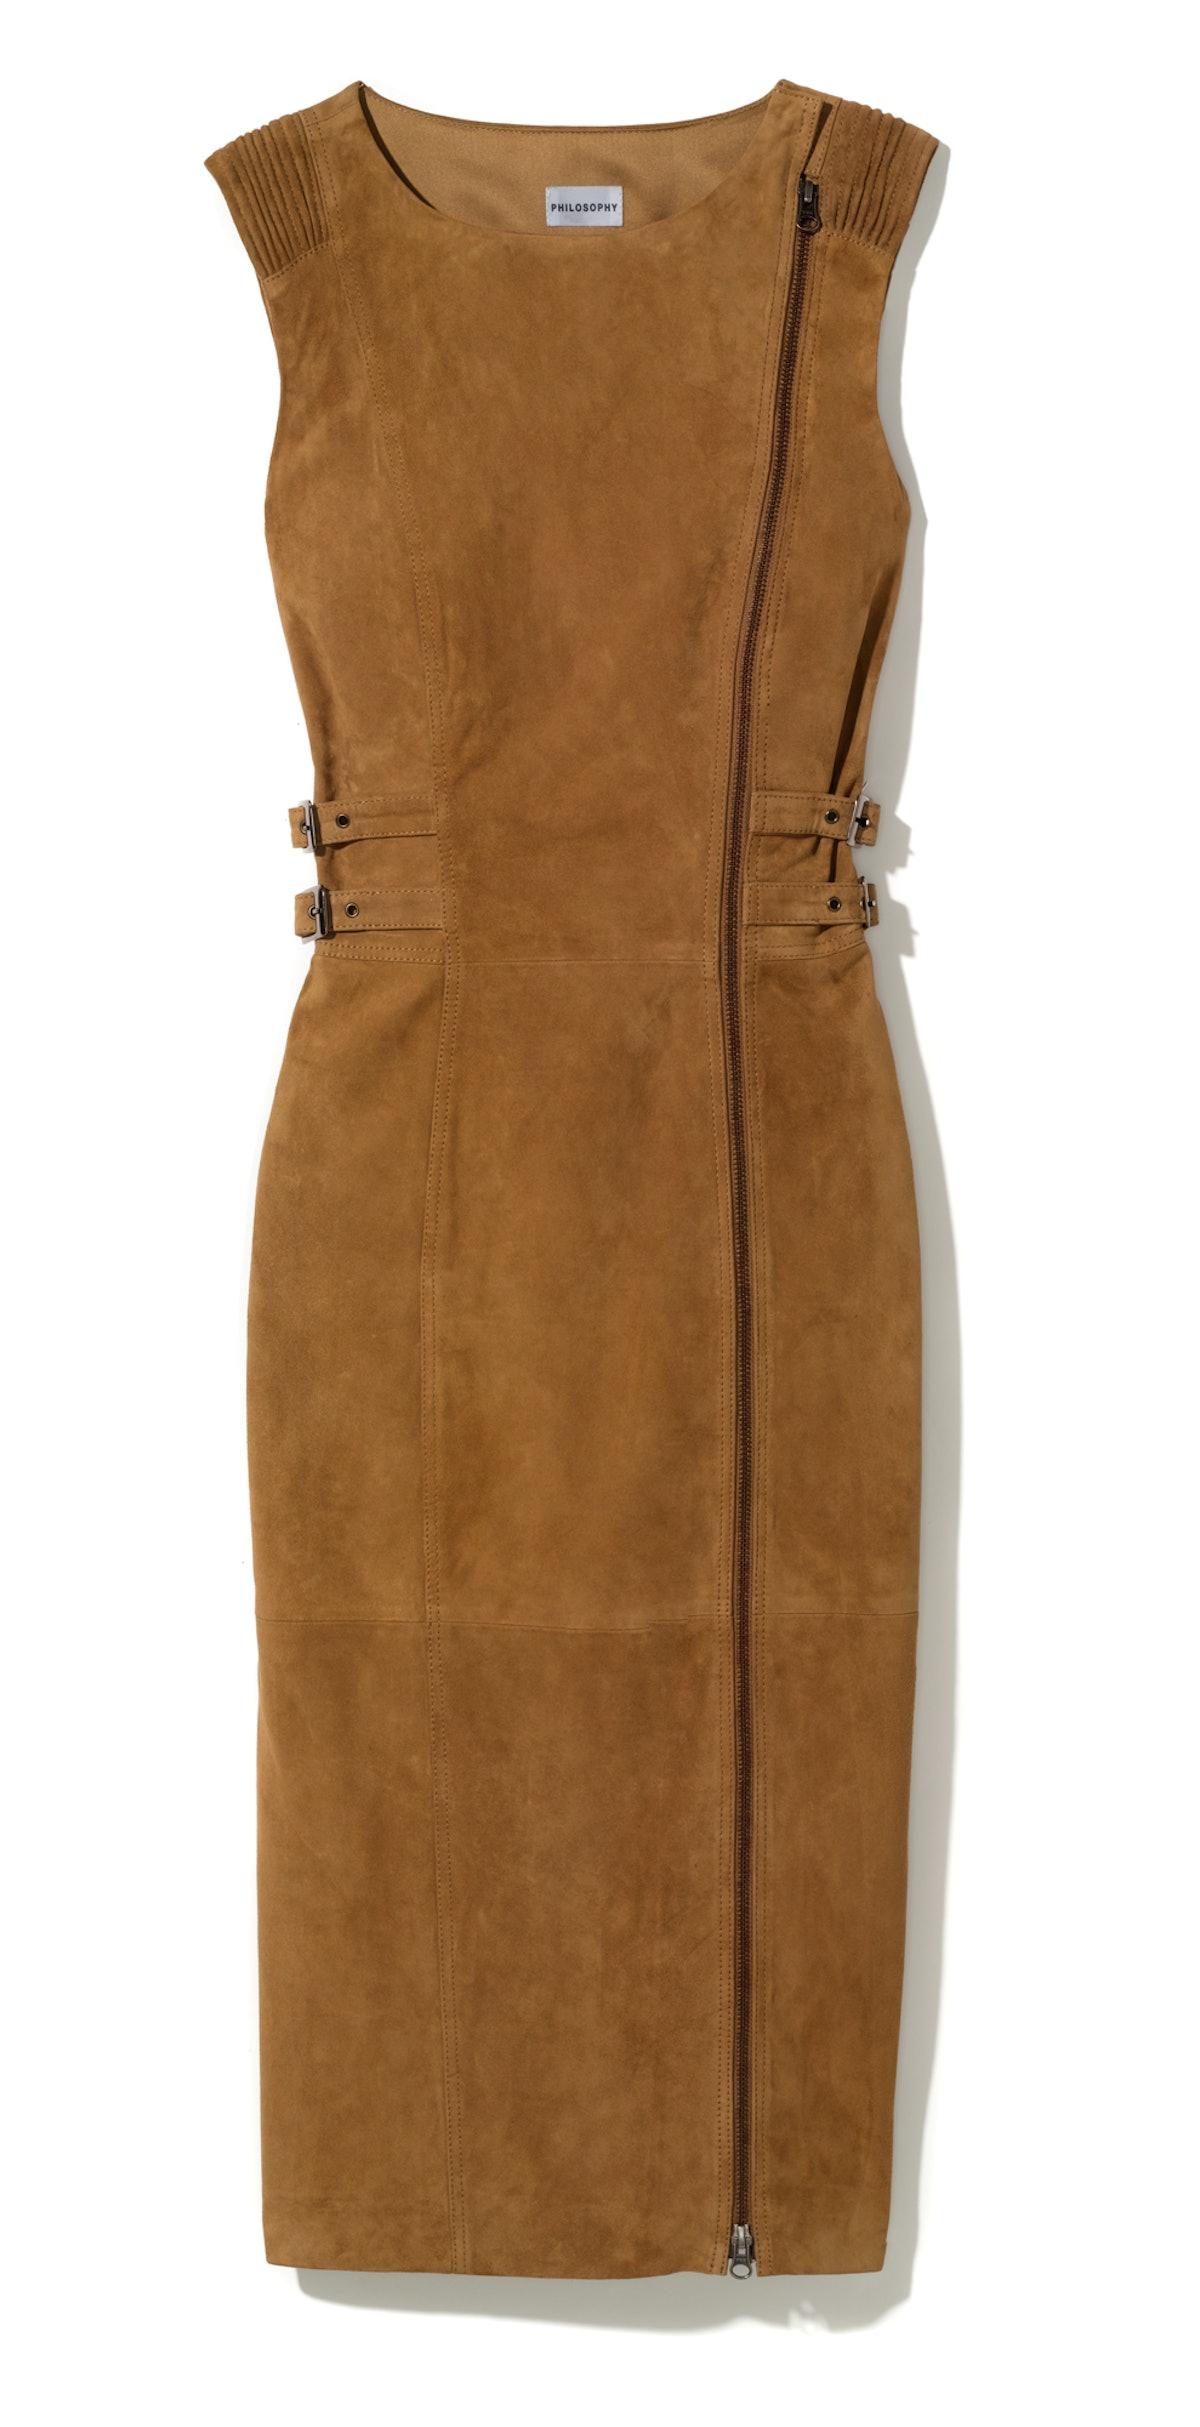 Philosophy by Natalie Ratabesi dress, $1,295, Philosophy, New York, 212.460.5500.